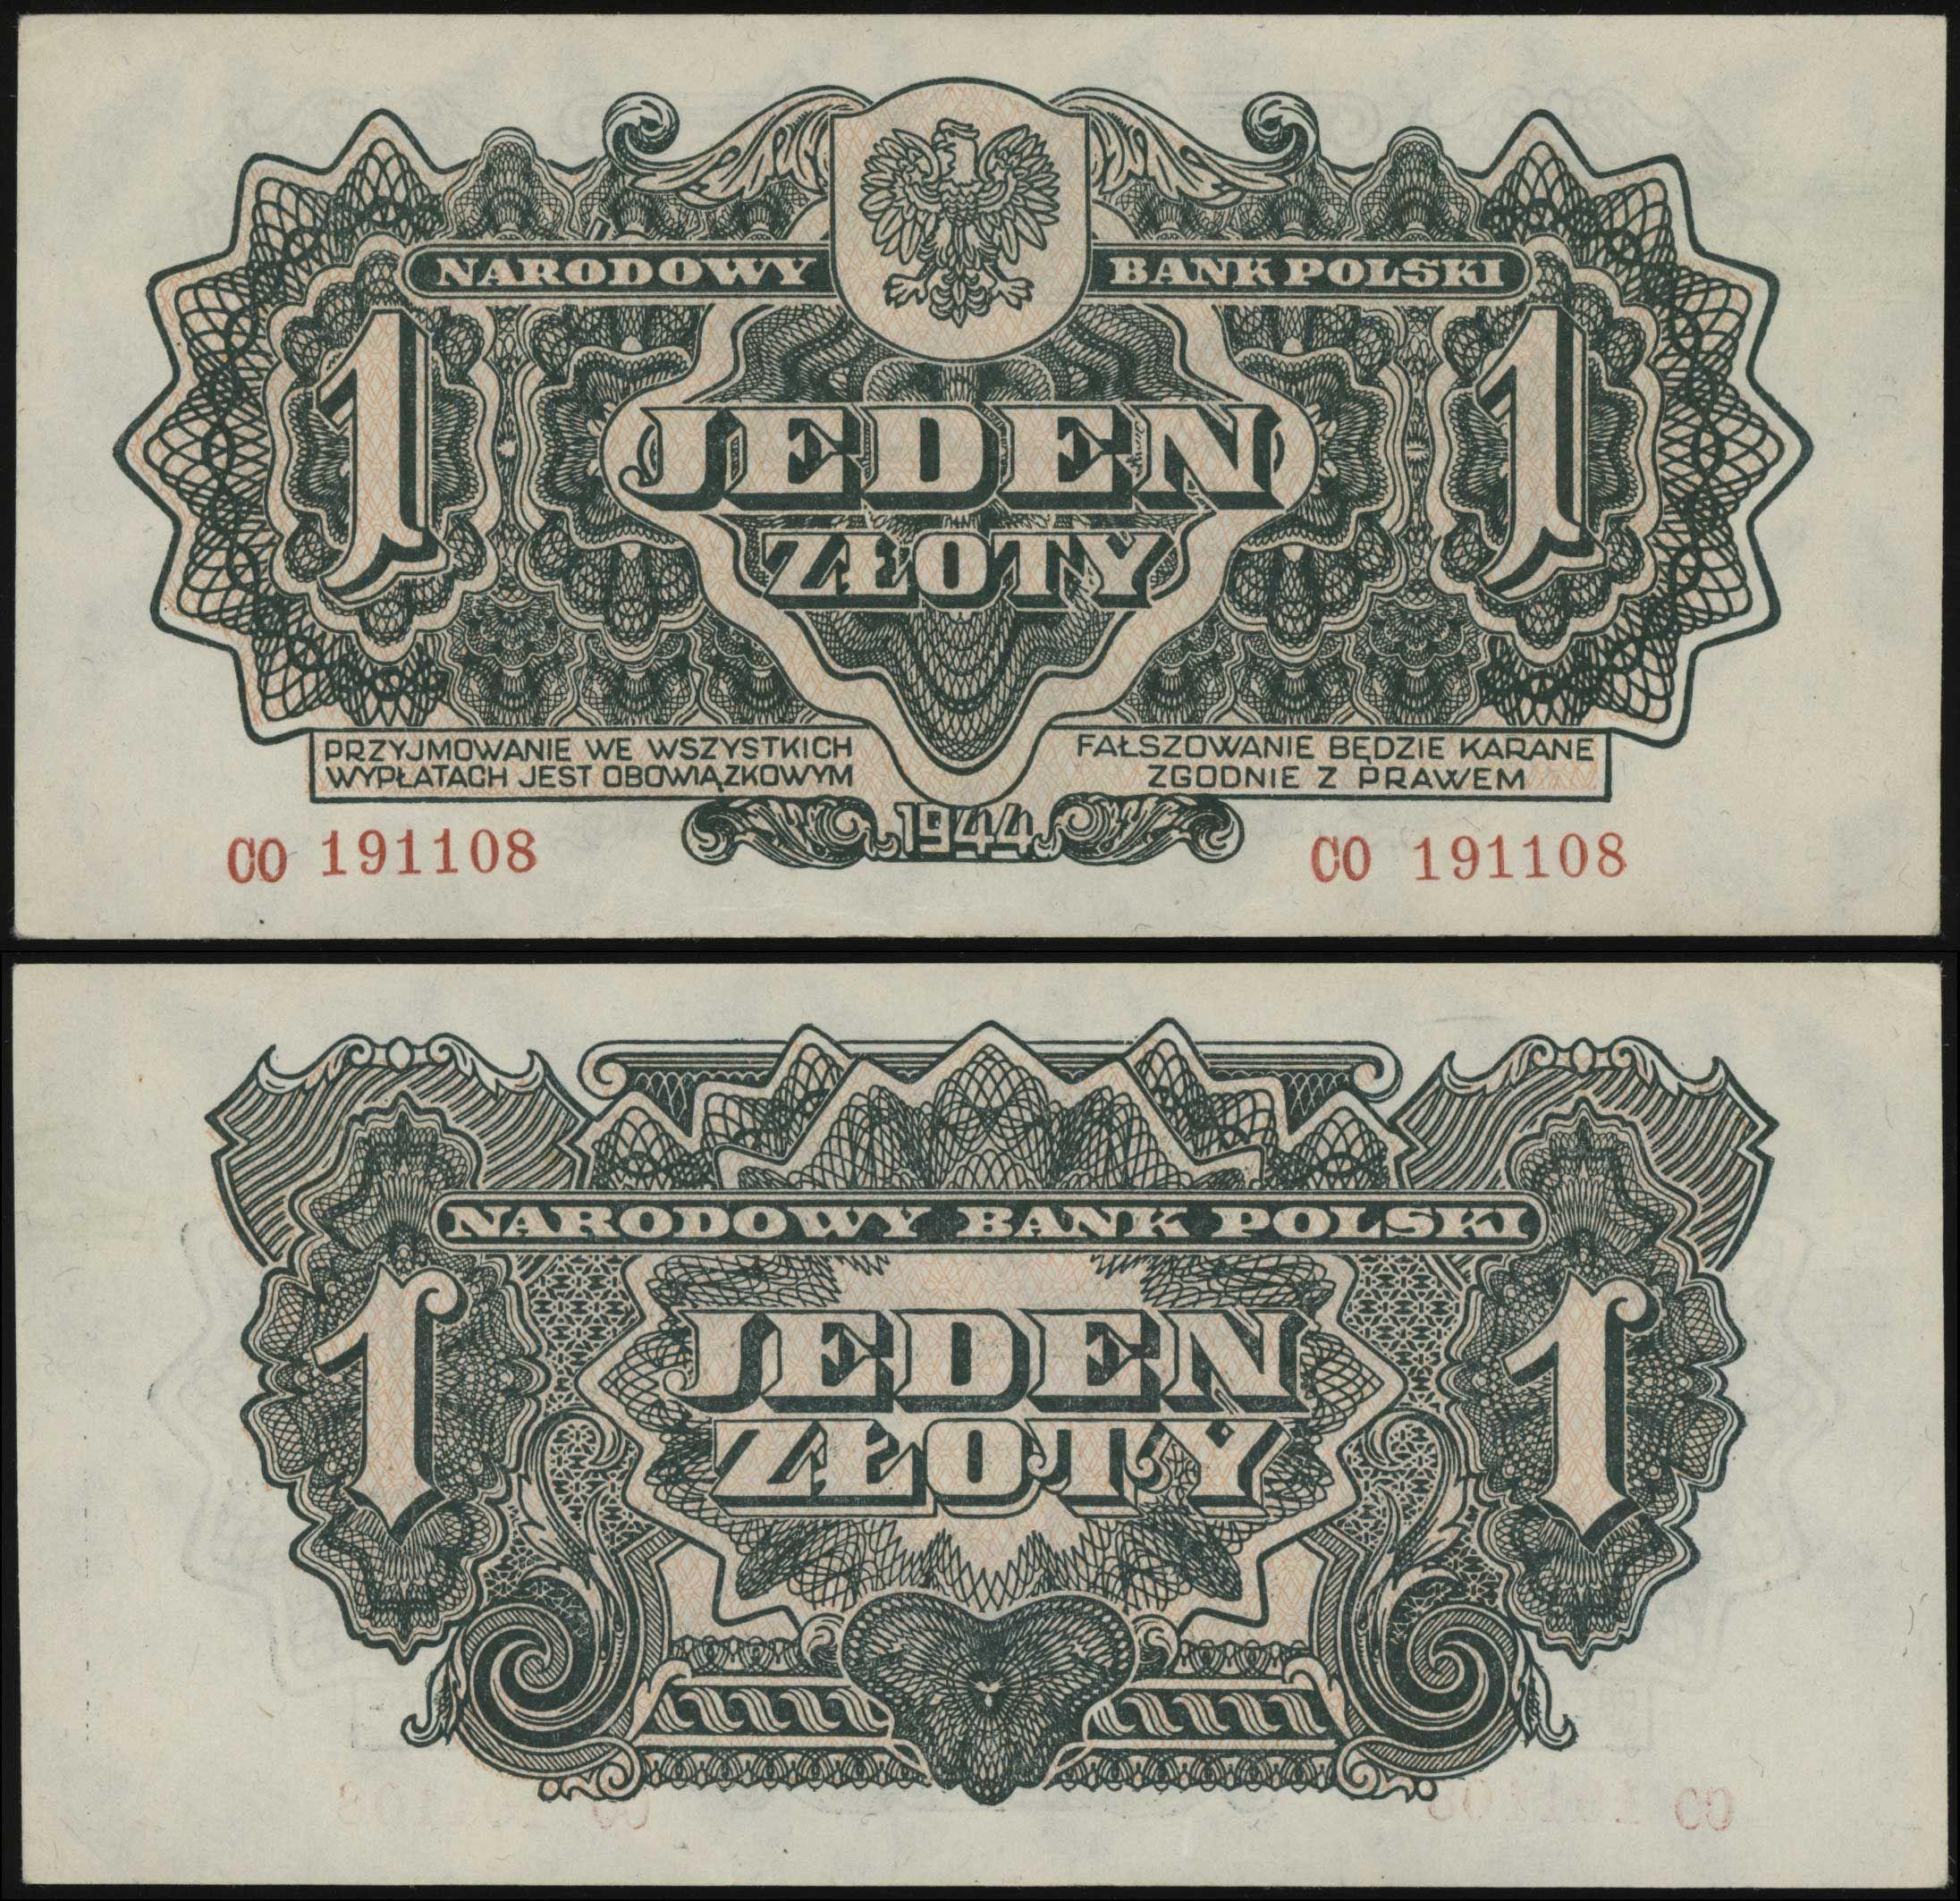 Poland 500 Zlotych 1990 Polish Bank Notes Paper Money Of Polska Banknotes Of Polonia Banknote Bank Notes Coins Currency Cu In 2020 Poland Bank Notes Currency